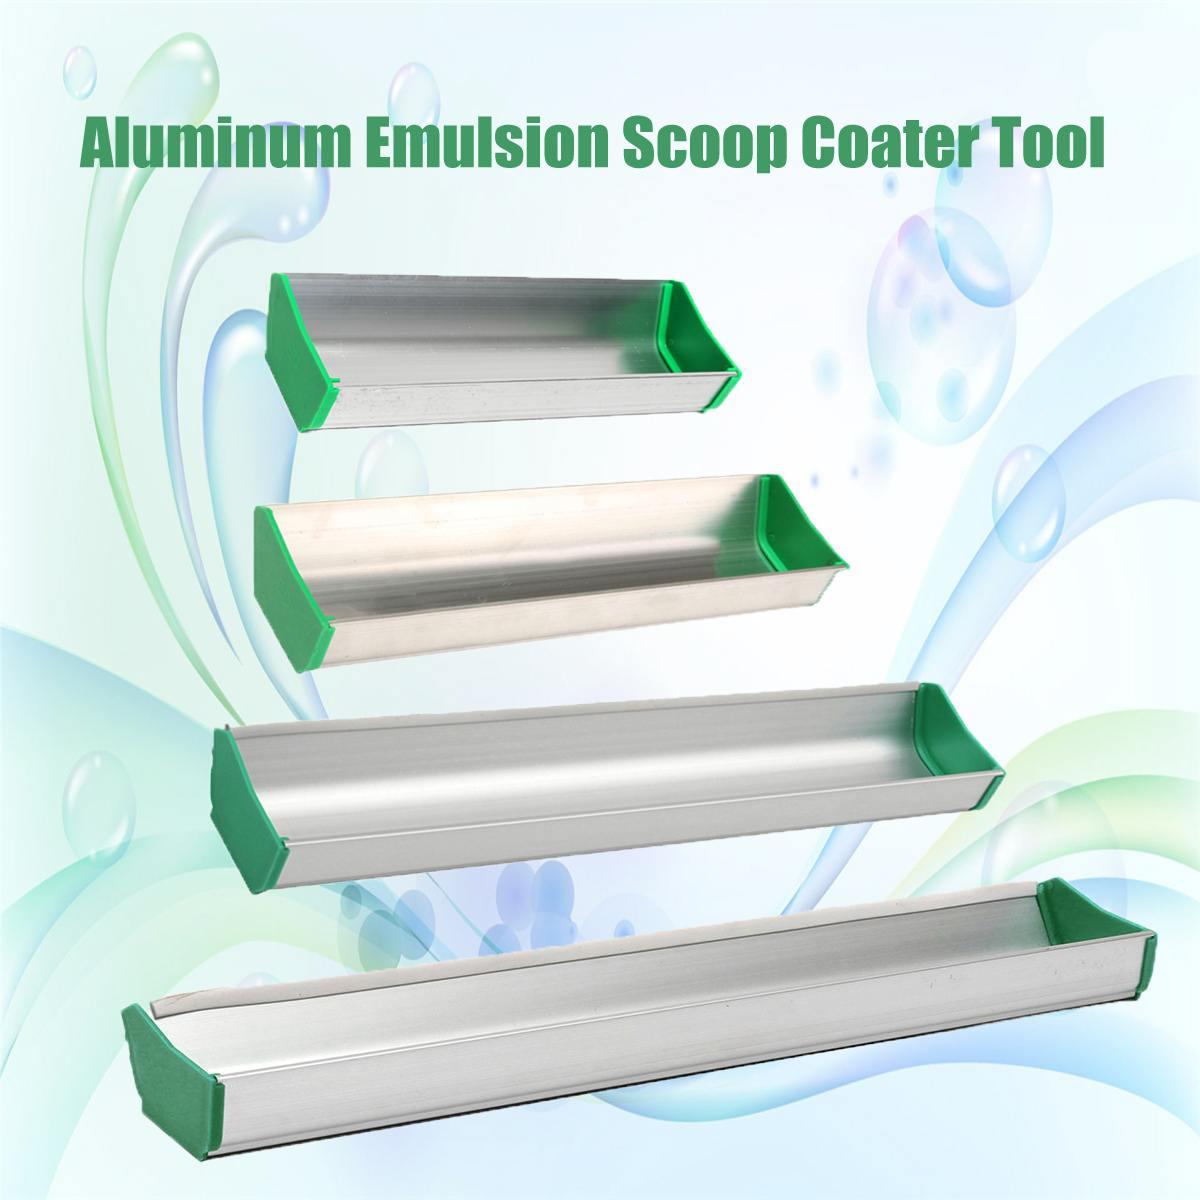 New 8/10/14/16inch Emulsion Scoop Coater Silk Screen Printing Aluminum Screen Printing Coating Tool